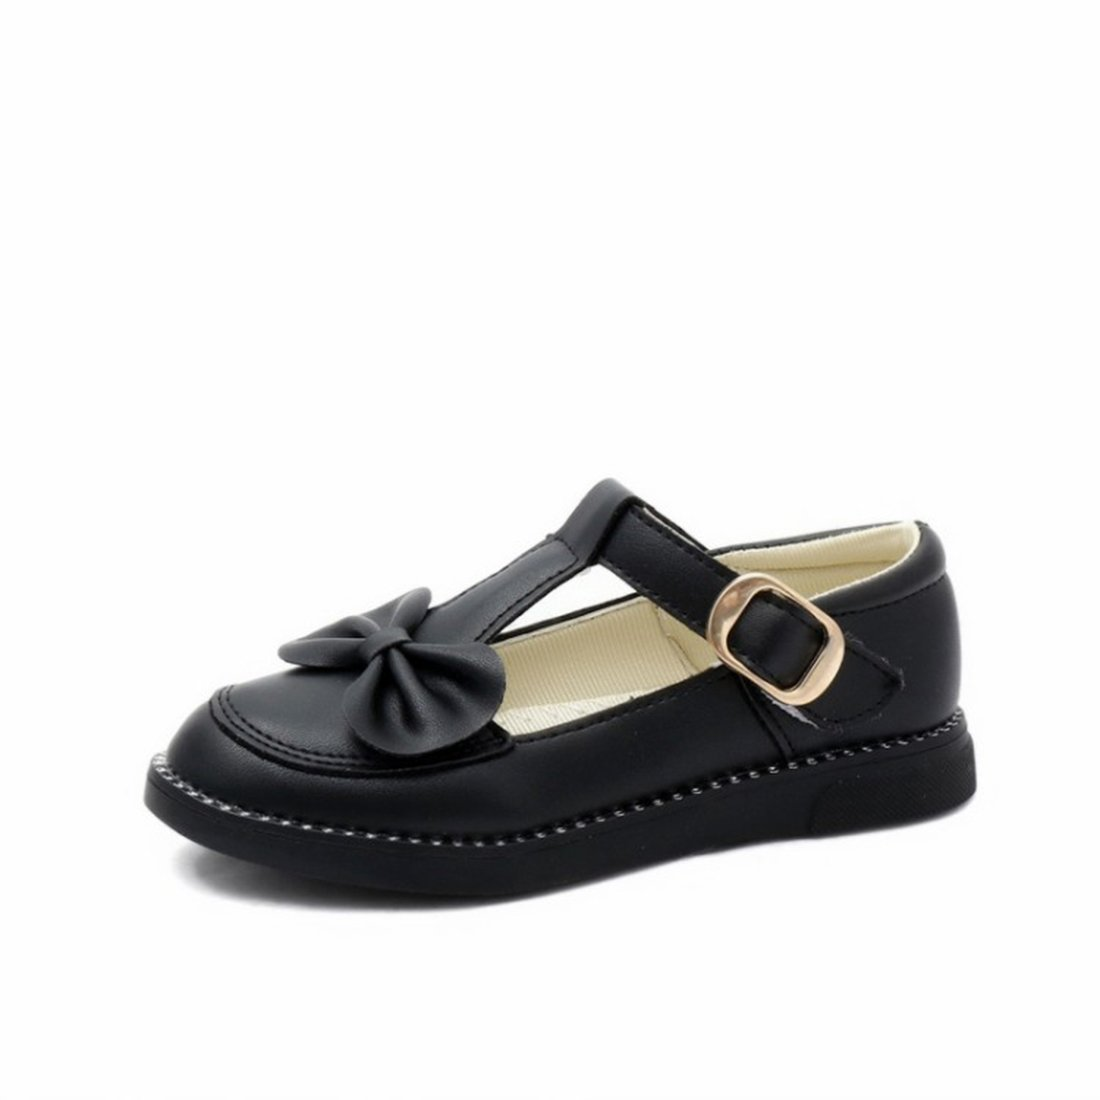 O&N Girls Children Bowknot Ballet Flat Mary Janes Princess Bridesmaid Wedding Party School Shoes